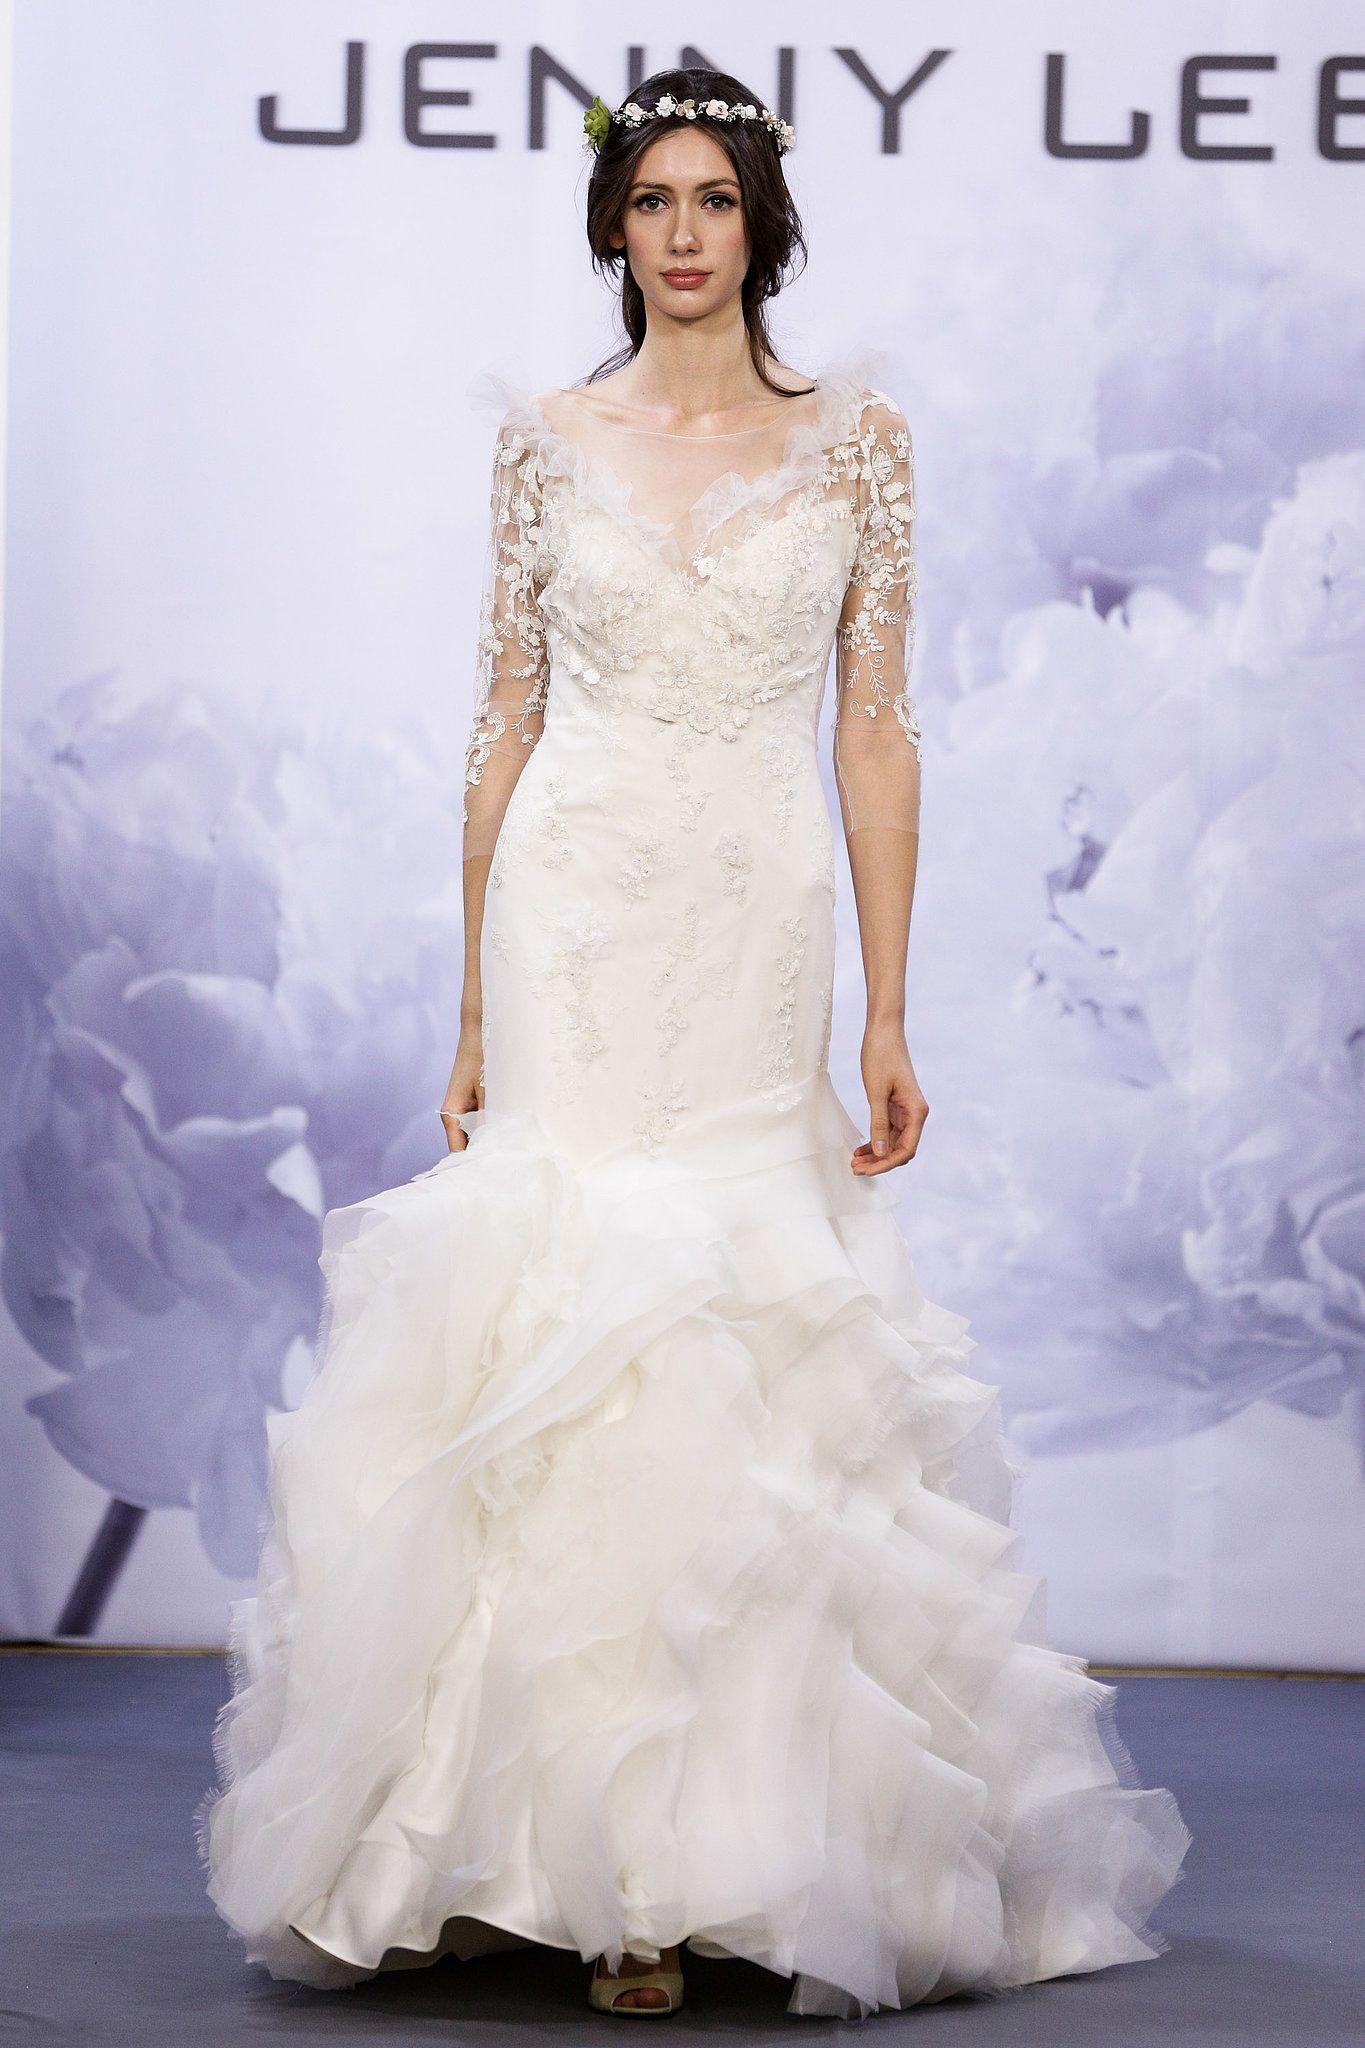 POPSUGAR Australia   Jenny Lee   Pinterest   Bridal fashion week ...